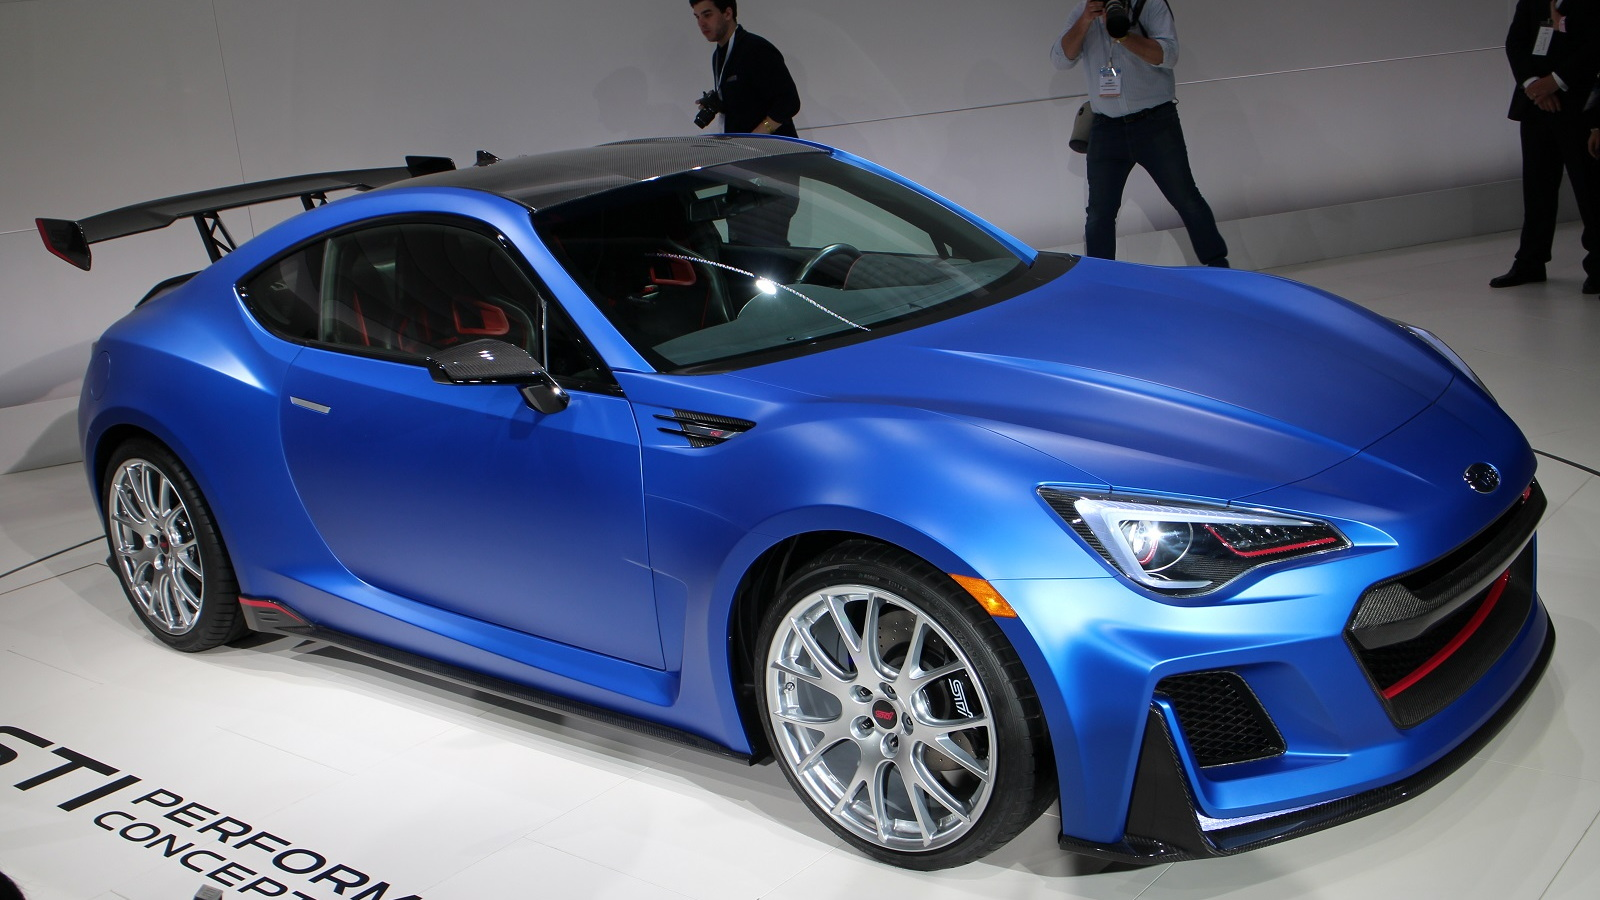 Subaru STI Performance Concept - 2015 New York Auto Show